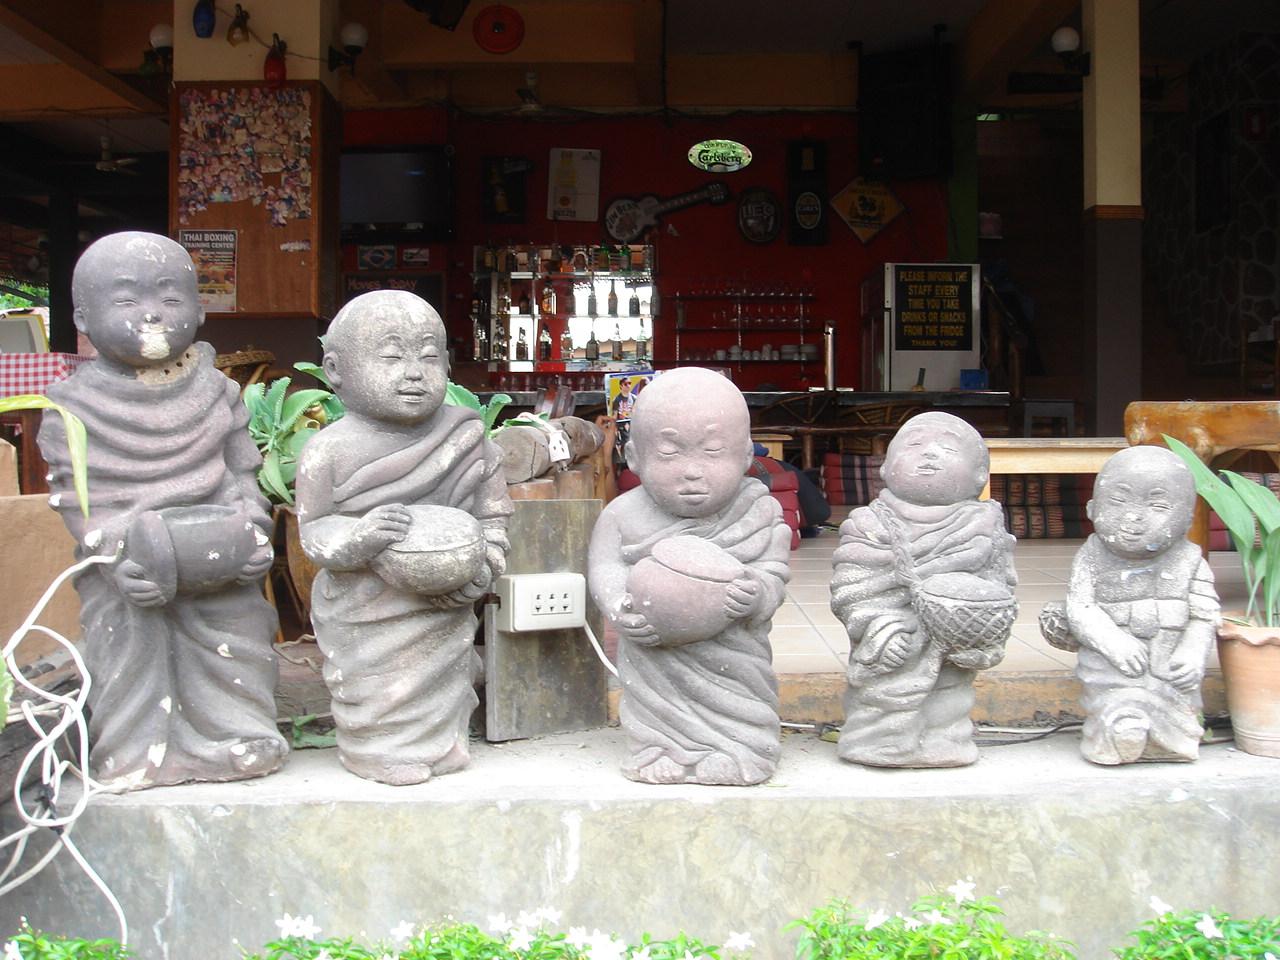 Cute little row of Buddhas outside a bar in Haad Rin. タイ・パンガン島の Haad Rin に建つバーの外にちょこんと並ぶかわいらしい仏像たち。